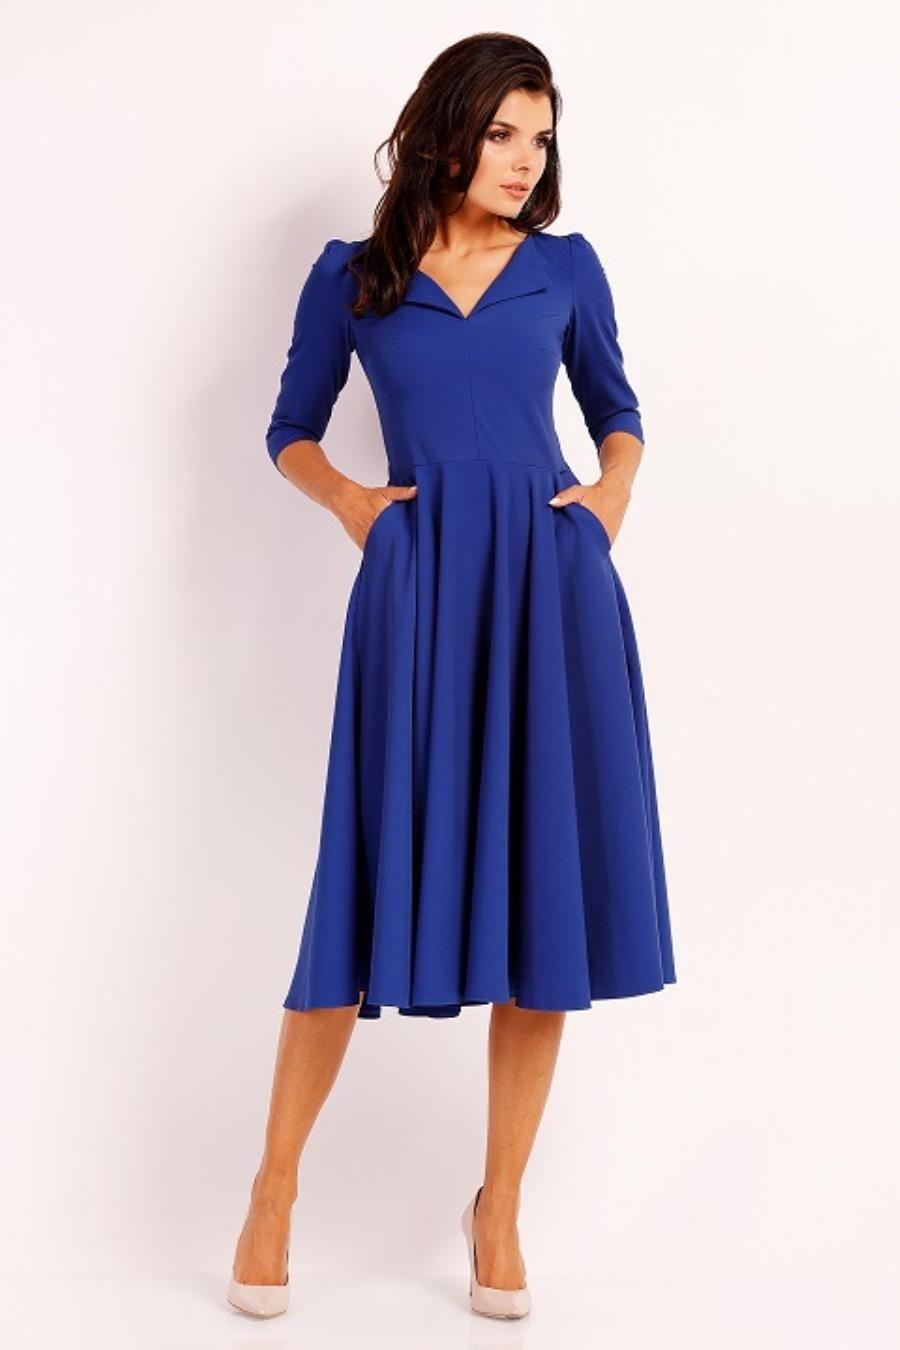 40fb16f7cf Elegancka Sukienka Midi z Dłuższym Rękawem Chabrowa NA454